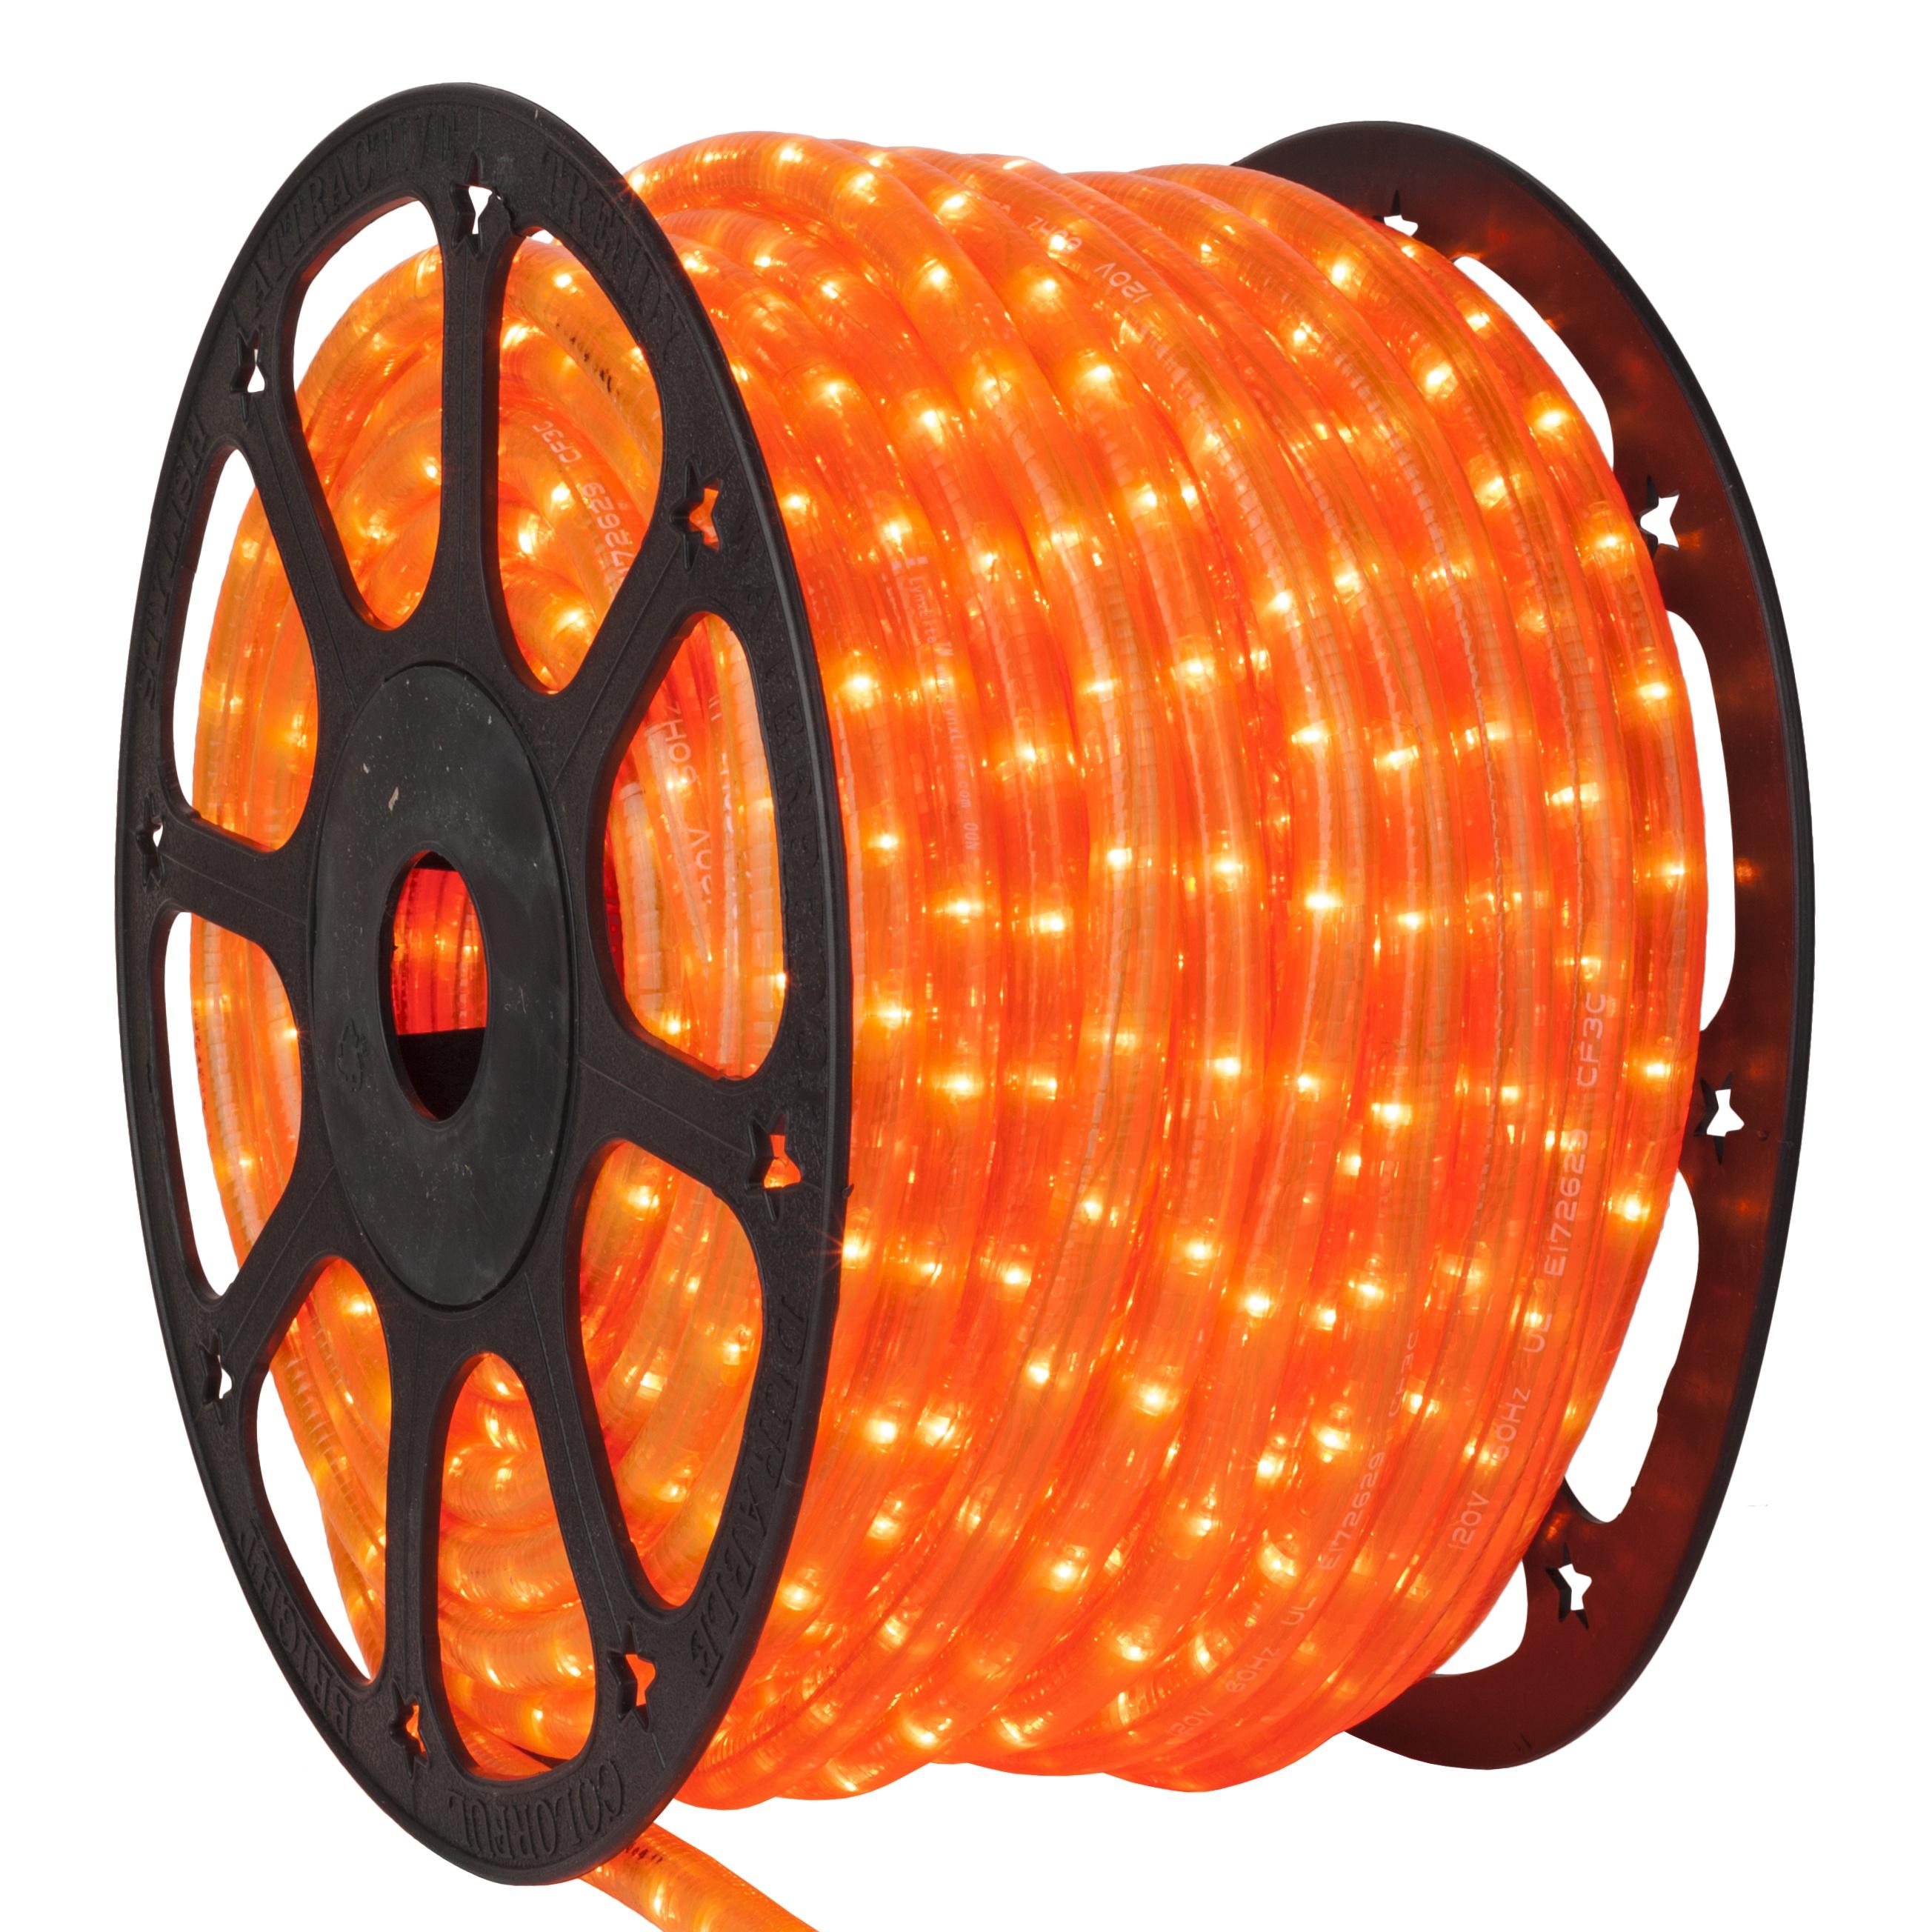 150' Fluorescent Orange Chasing Rope Light